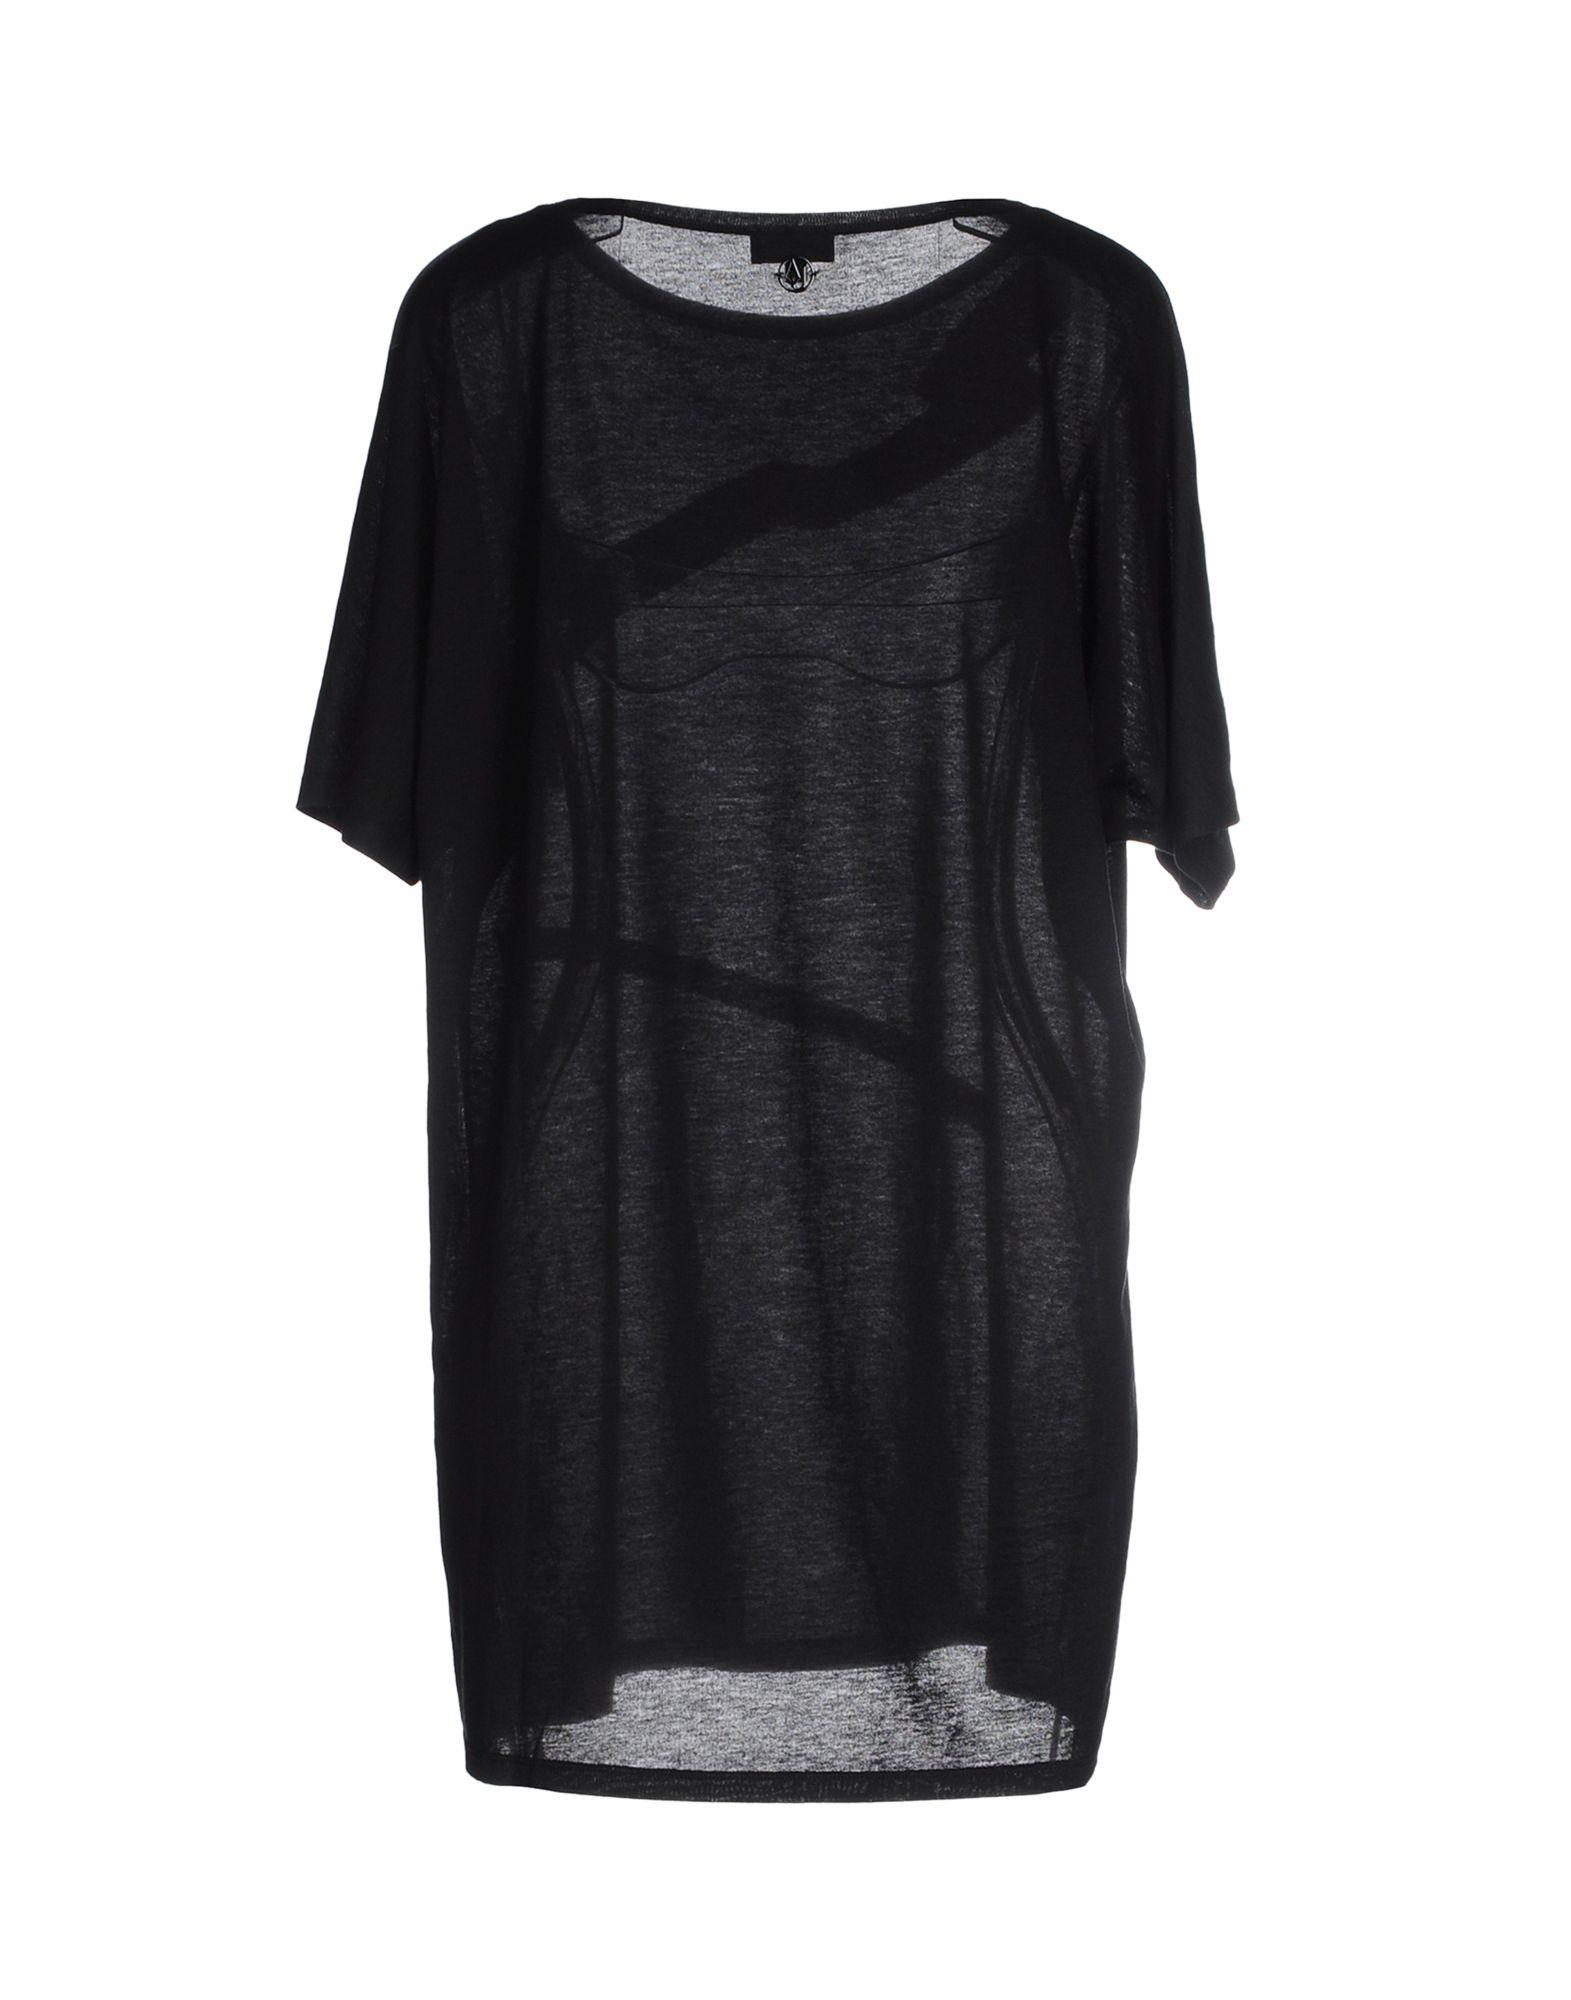 Armani jeans t shirt in black lyst for Black armani t shirt